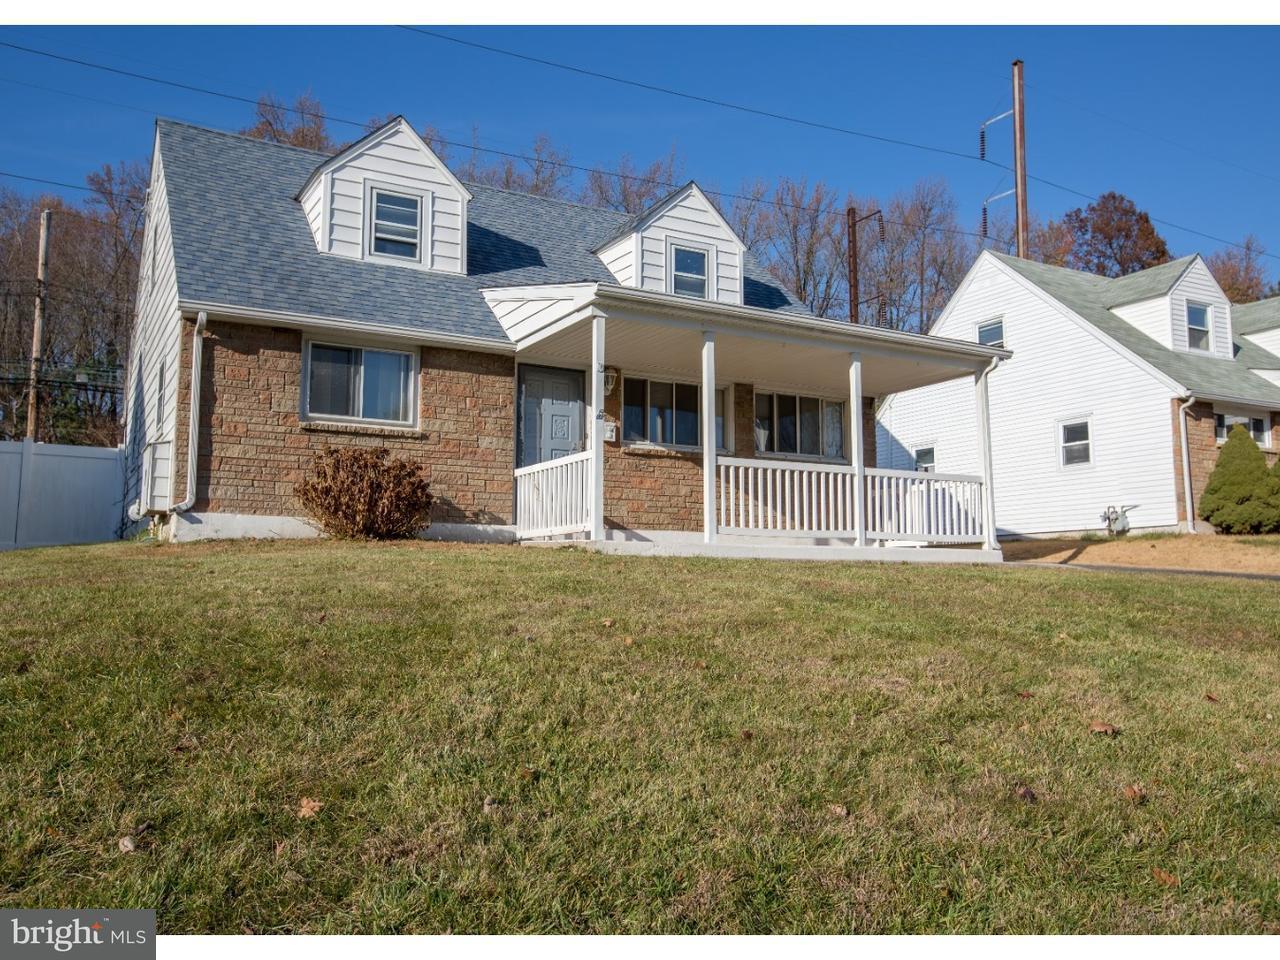 Single Family Home for Sale at 2447 SECANE Road Secane, Pennsylvania 19018 United States